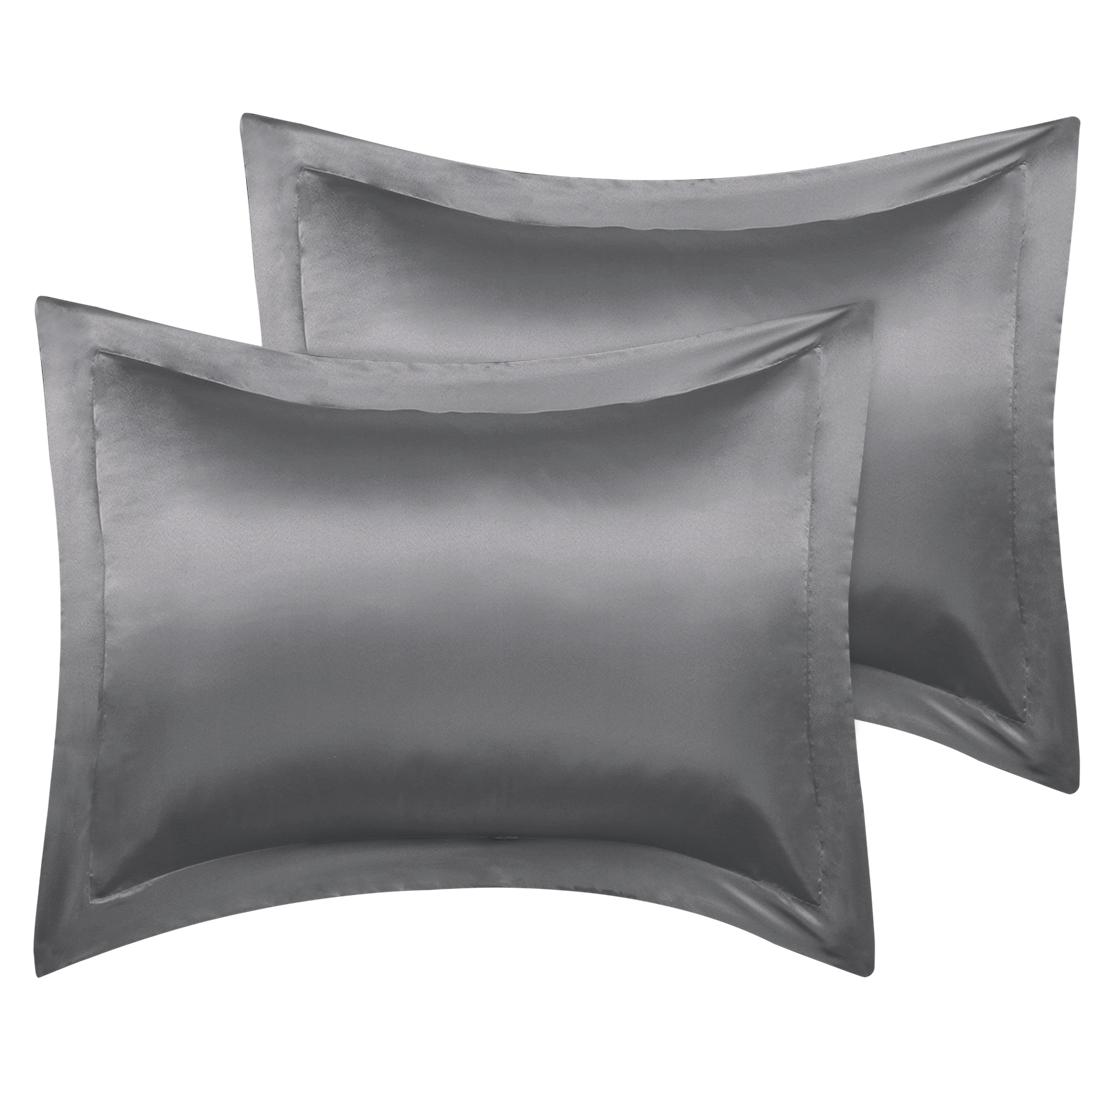 2 Pcs Deep Grey Pillow Shams Satin Pillow Cases King Oxford Pillowcases